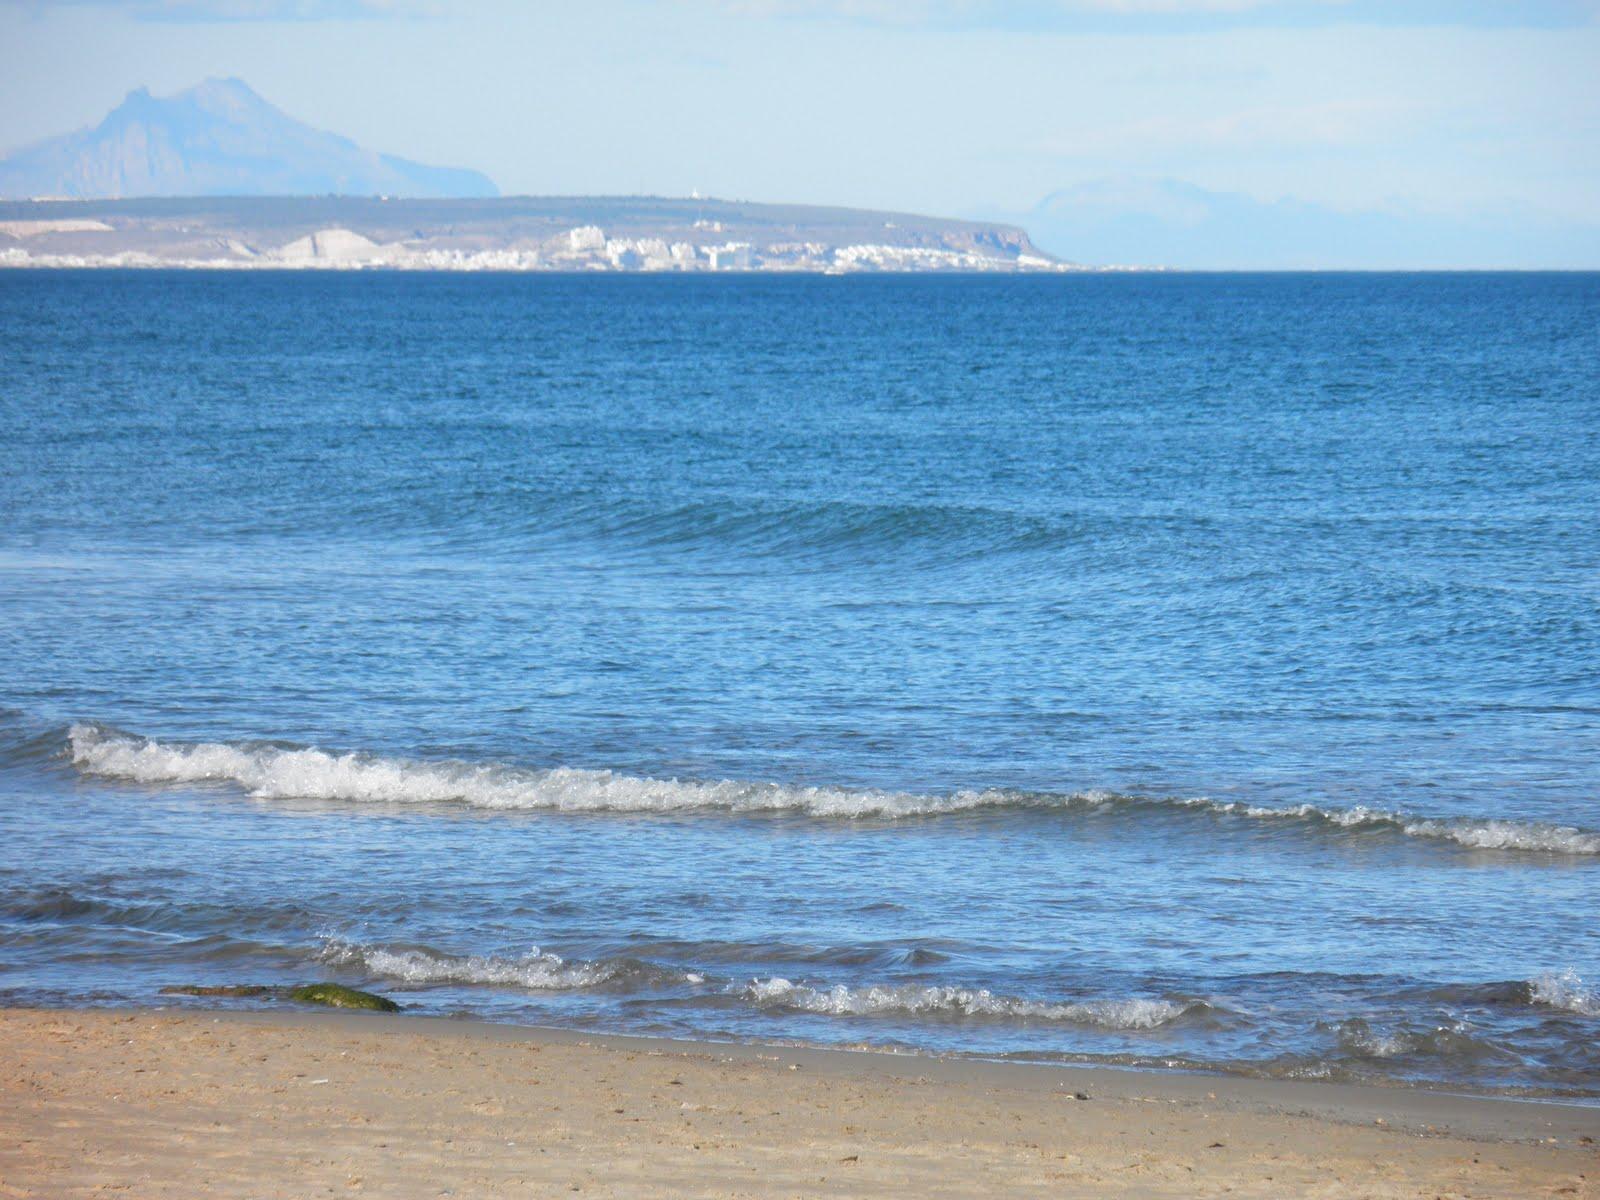 Maite free playas de guardamar flora de la laguna de la mata - Cabo santa pola ...